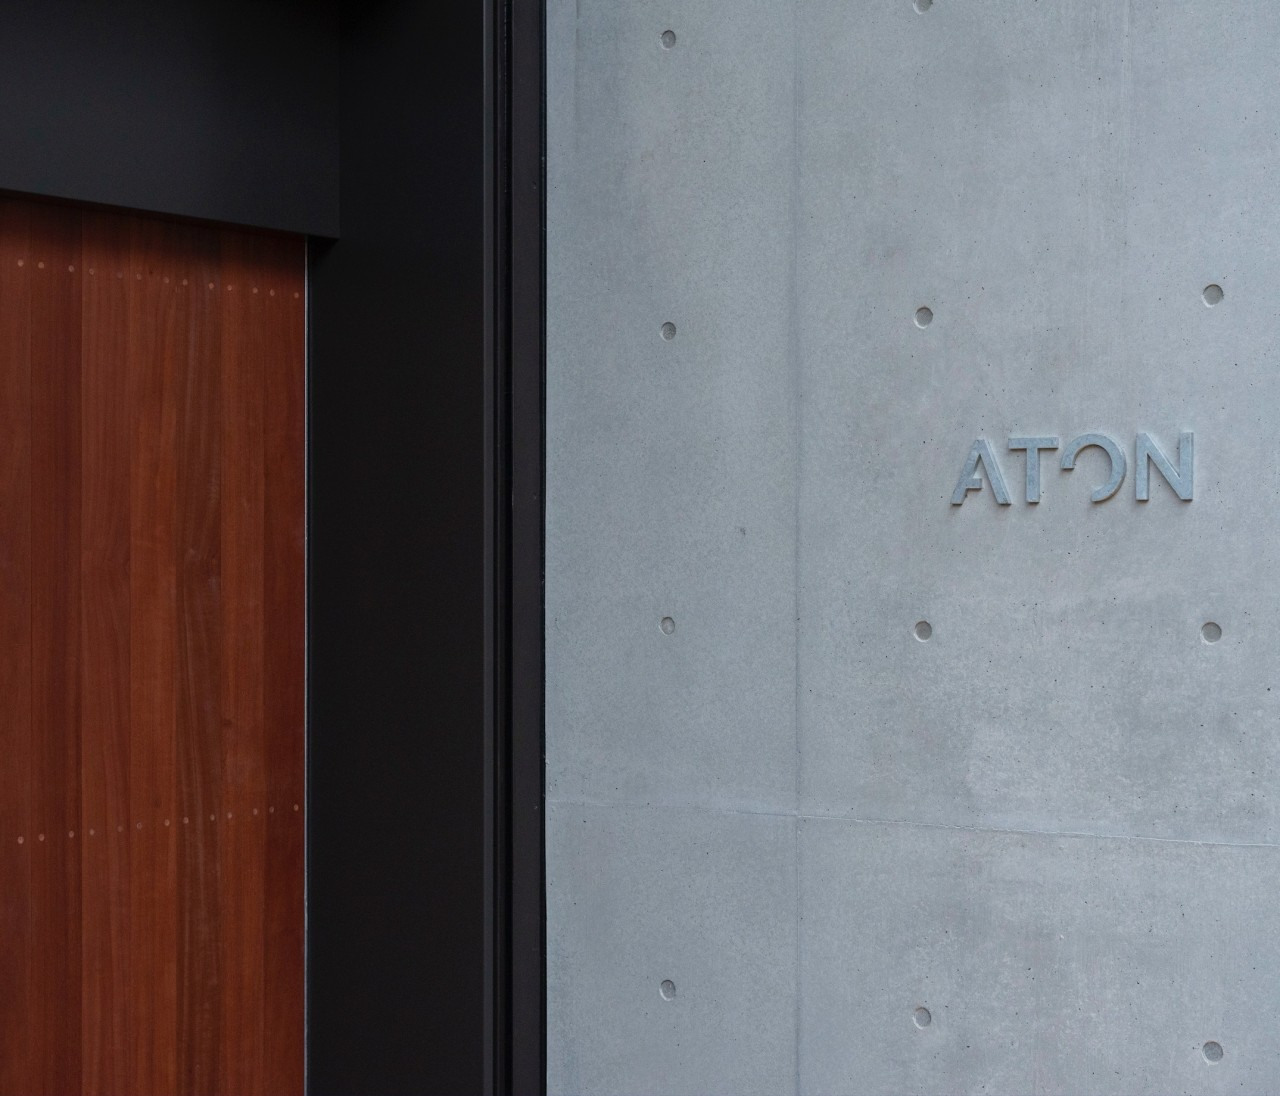 ATON初の直営店が12月8日(土)表参道にオープン!